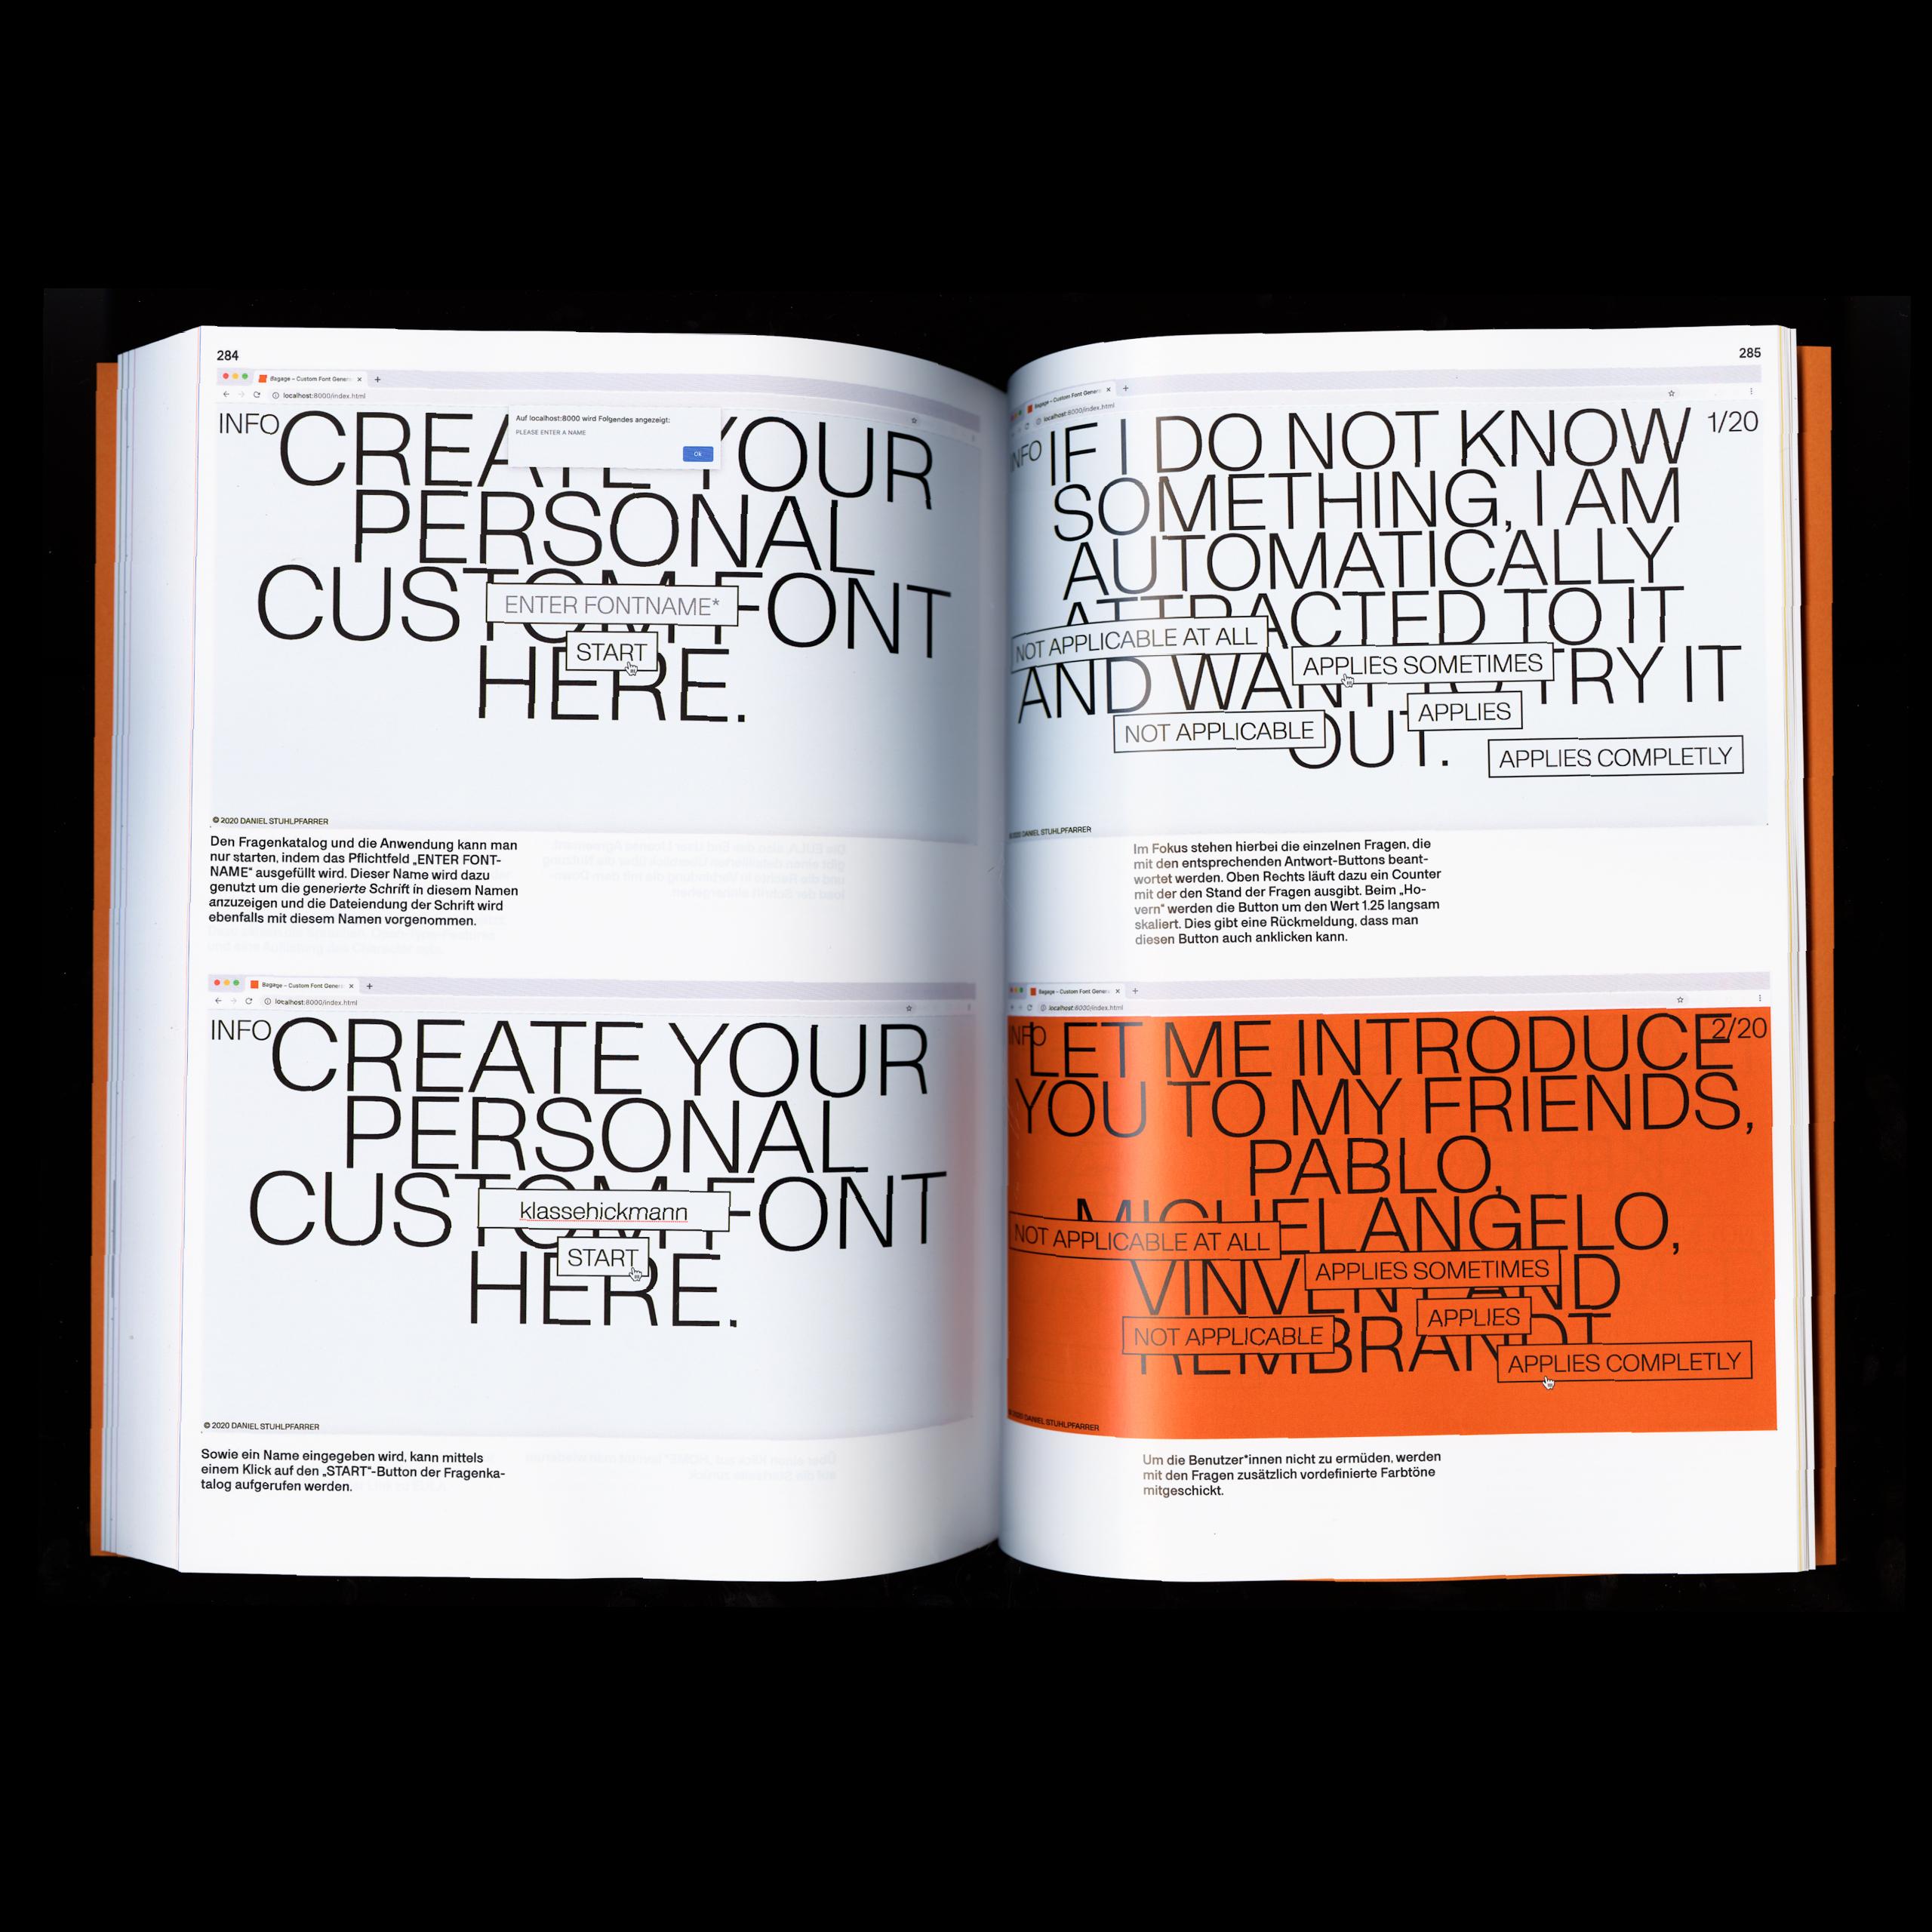 Daniel_Stuhlpfarrer_Spekulative-Schriftgestaltung-Speculative-Type-Design_WEB78